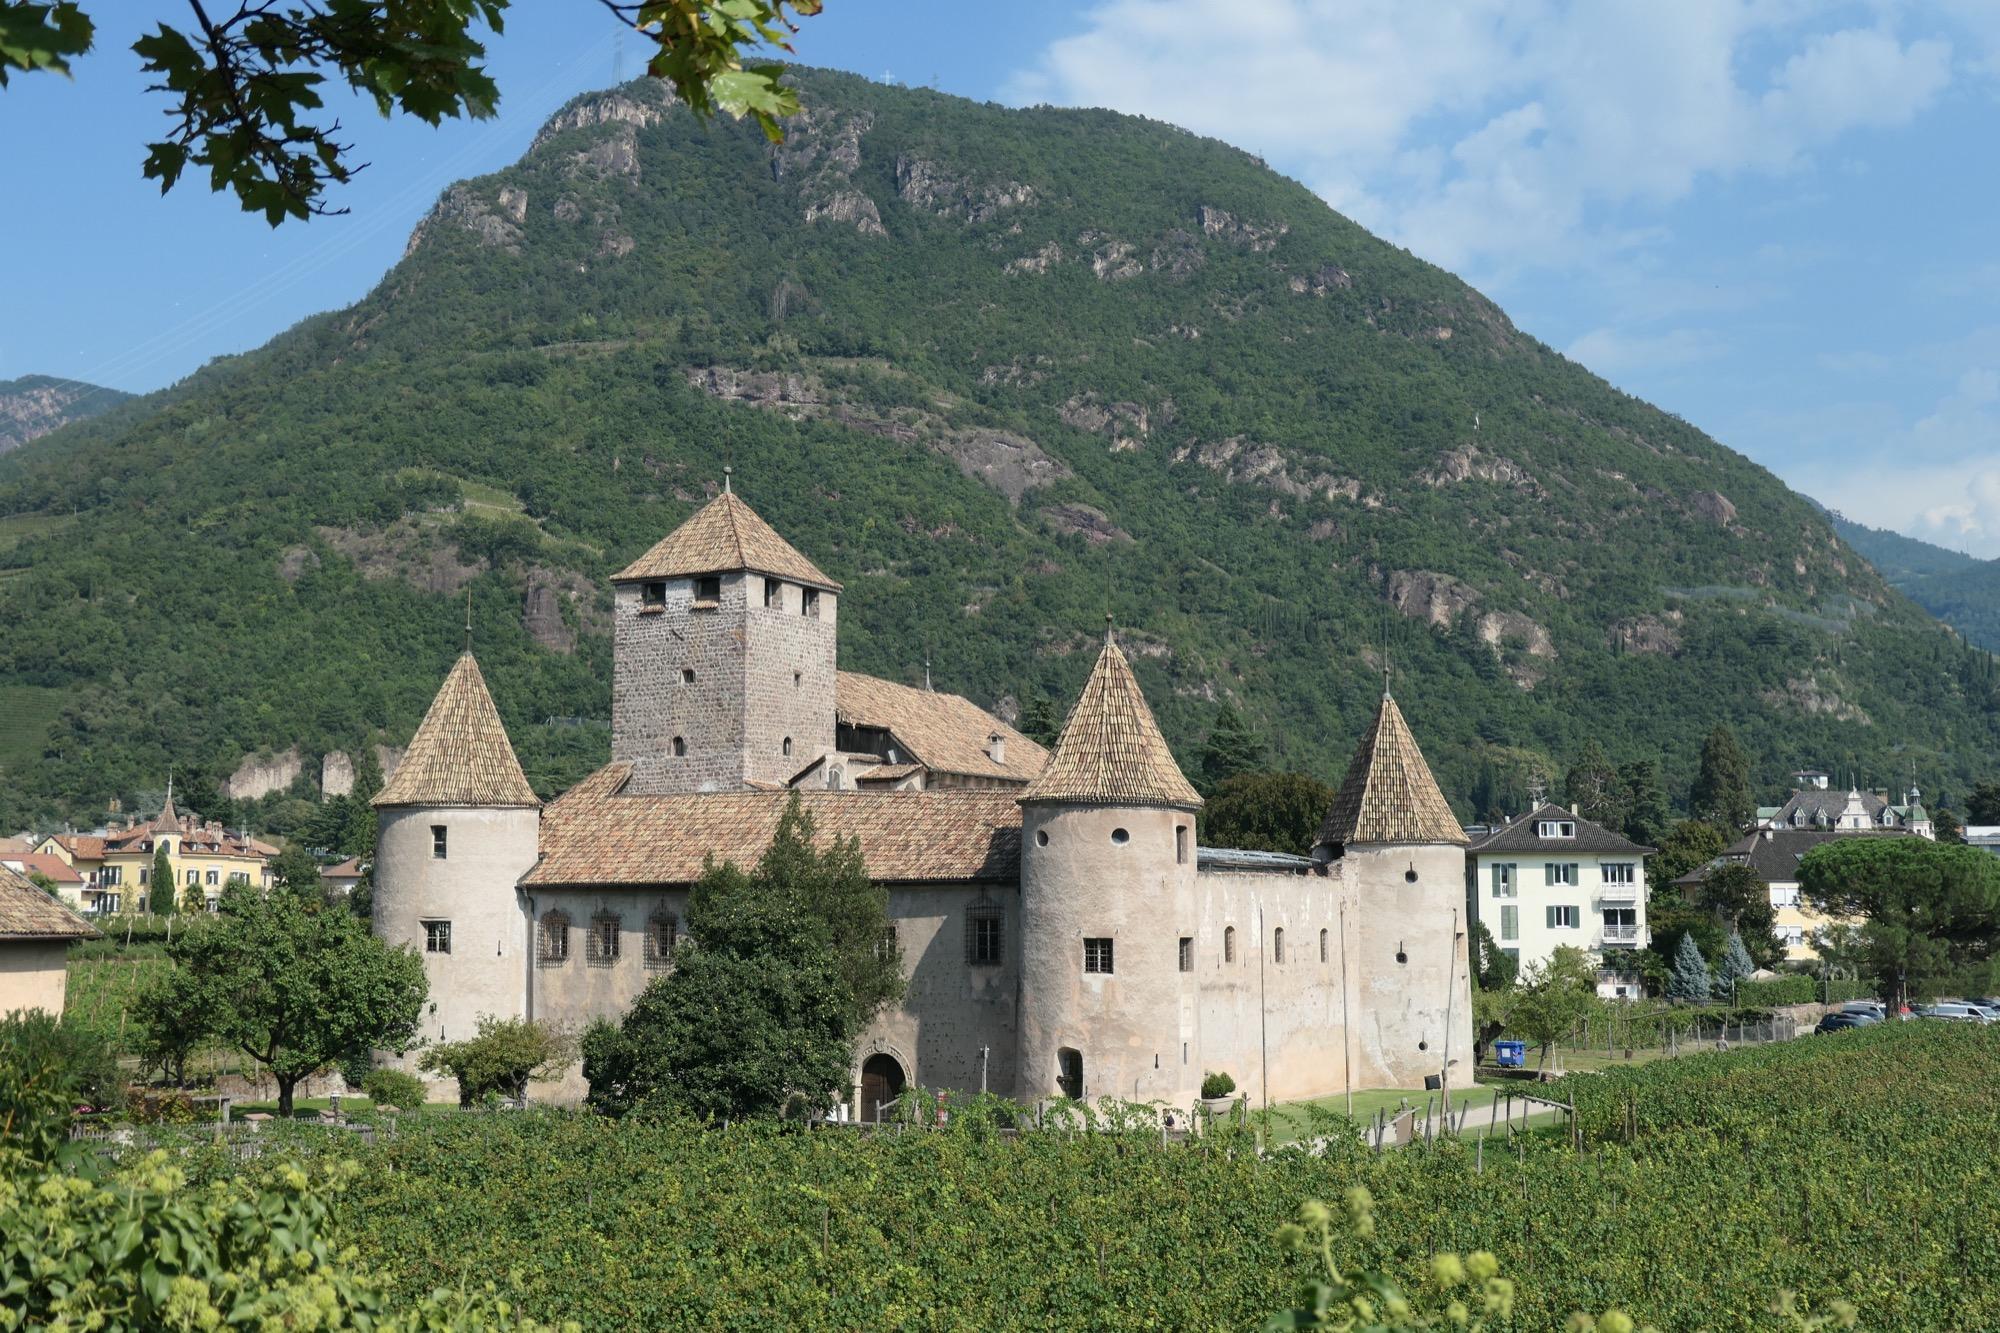 Maretsch Castle / Castel Mareccio in Bolzano